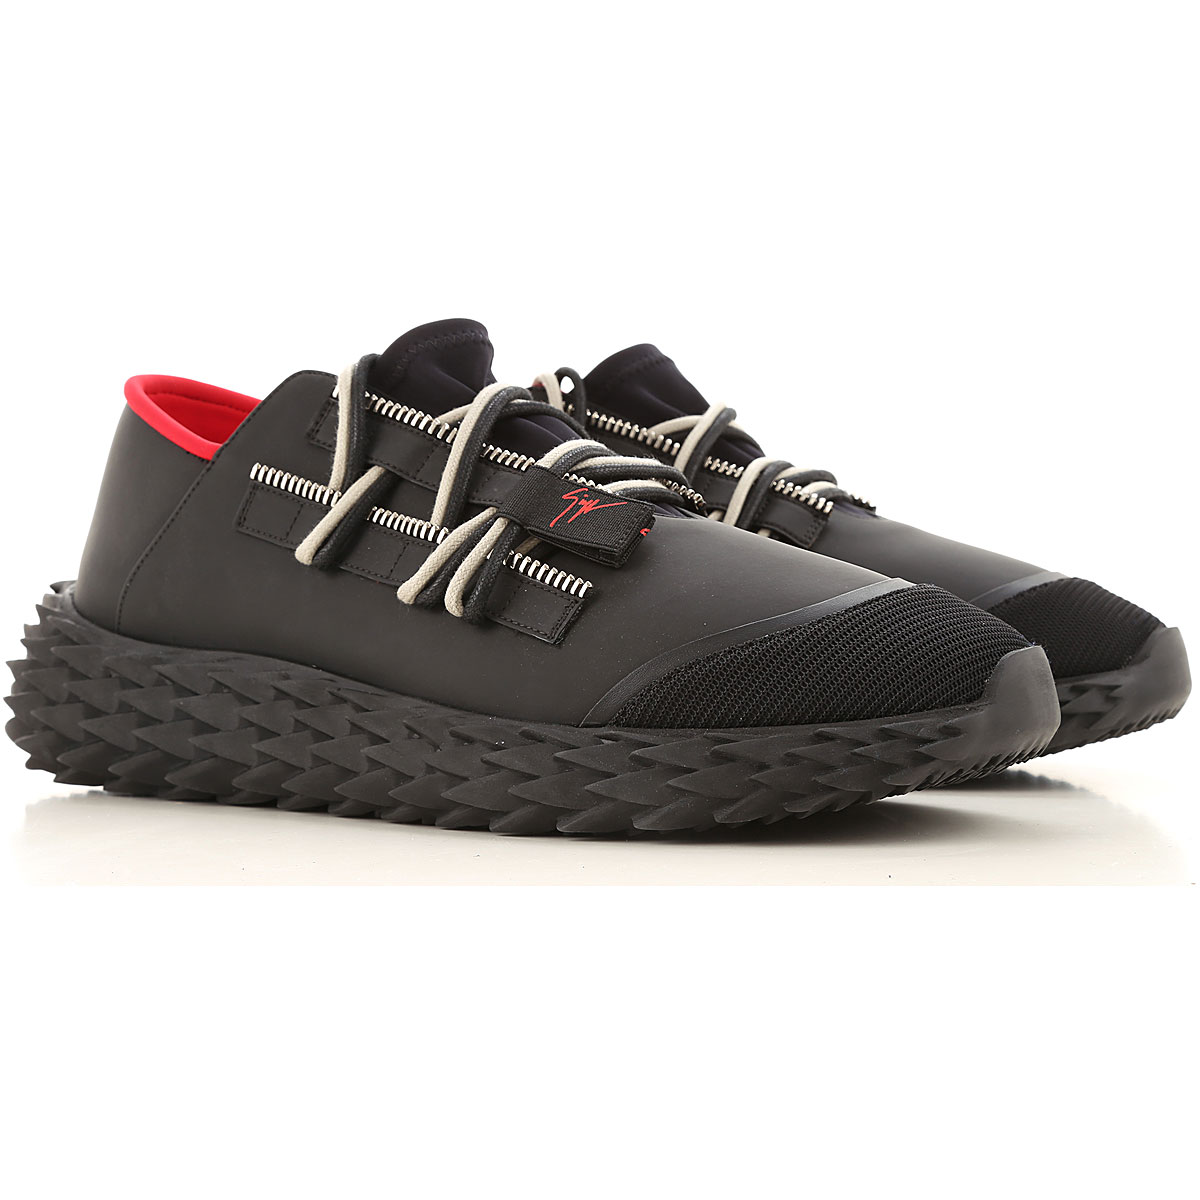 Giuseppe Zanotti Design Sneakers for Men On Sale, Black, Leather, 2019, 10 7 7.5 7.75 8 9 9.5